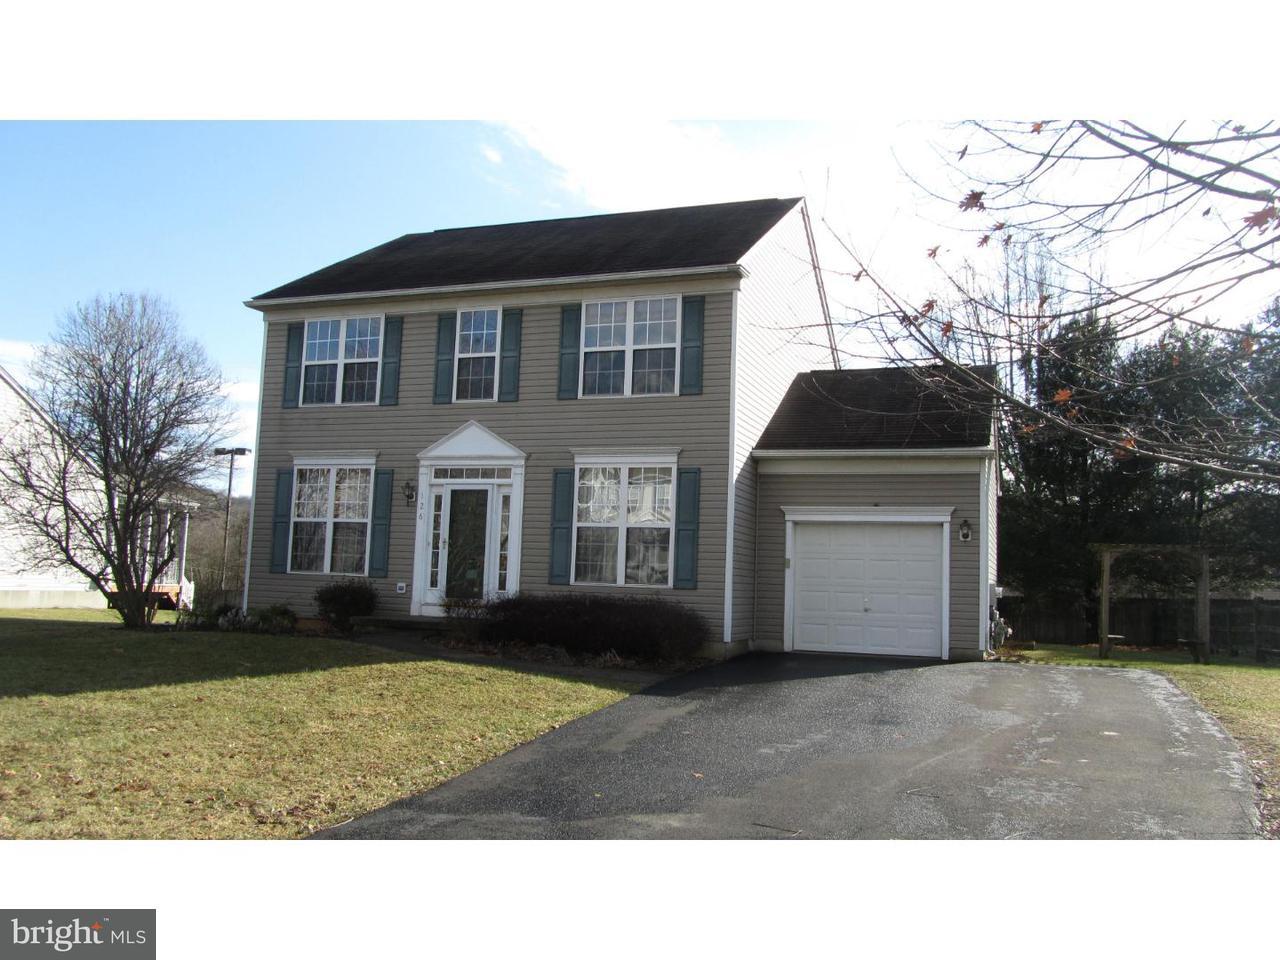 Single Family Home for Sale at 126 NEWPORT Circle Atglen, Pennsylvania 19310 United States